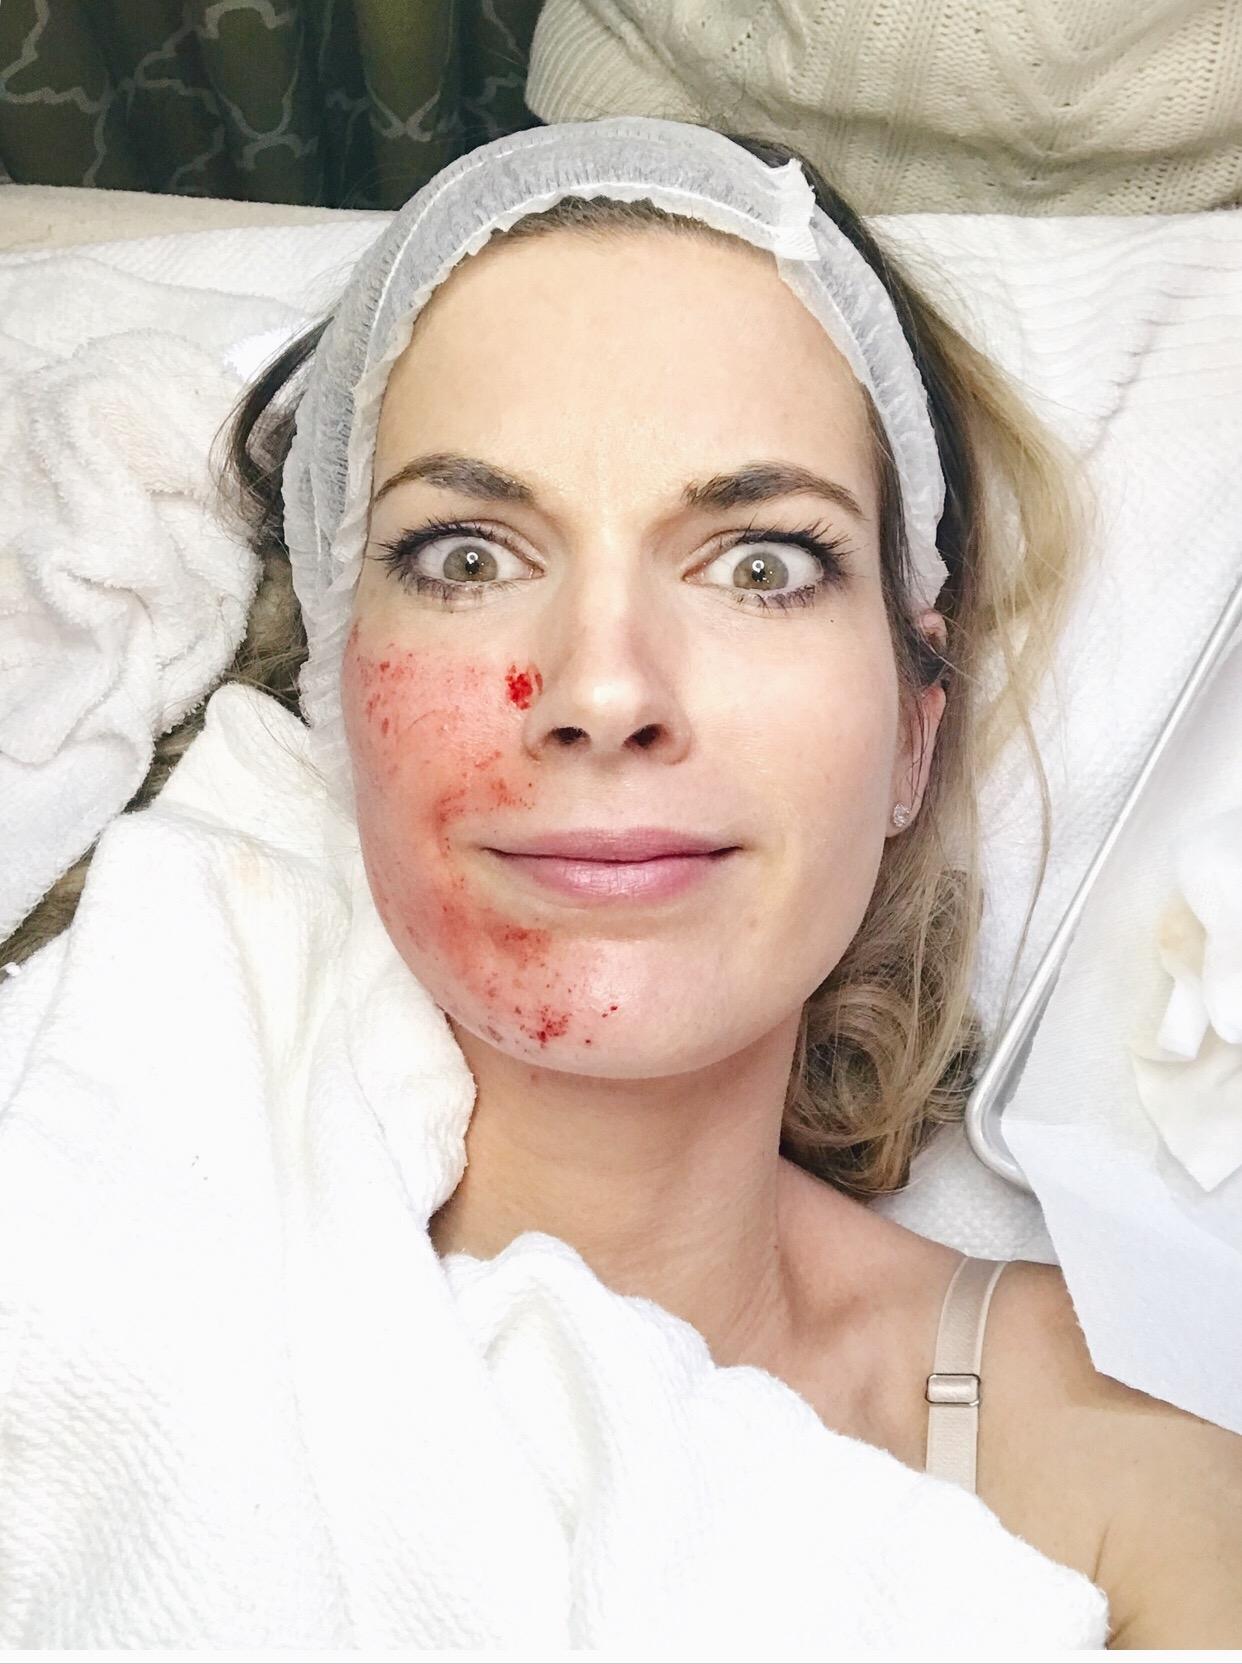 vampire facial review on pinteresting plans fashion blog